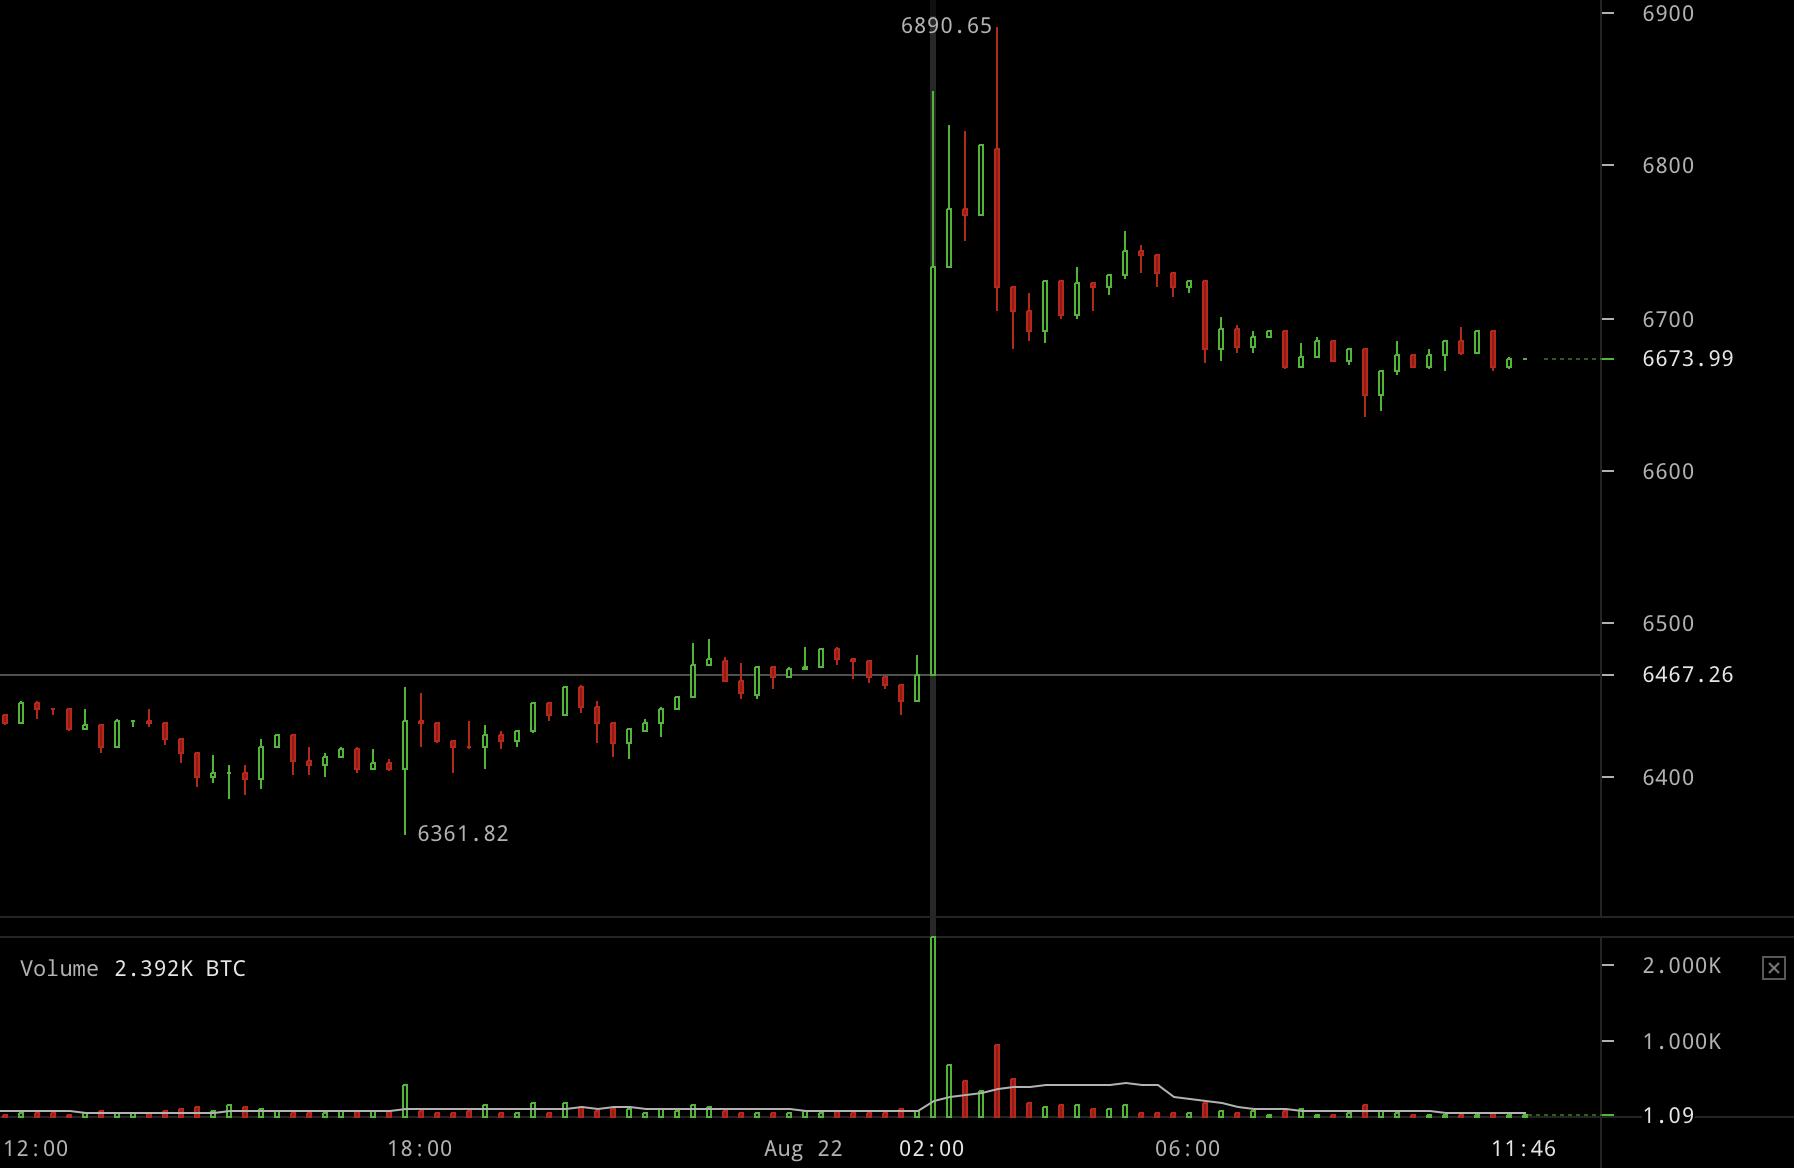 """Bitmex Exchange"" - pradedantiesiems skirtas vadovas - iaeregionas.lt"